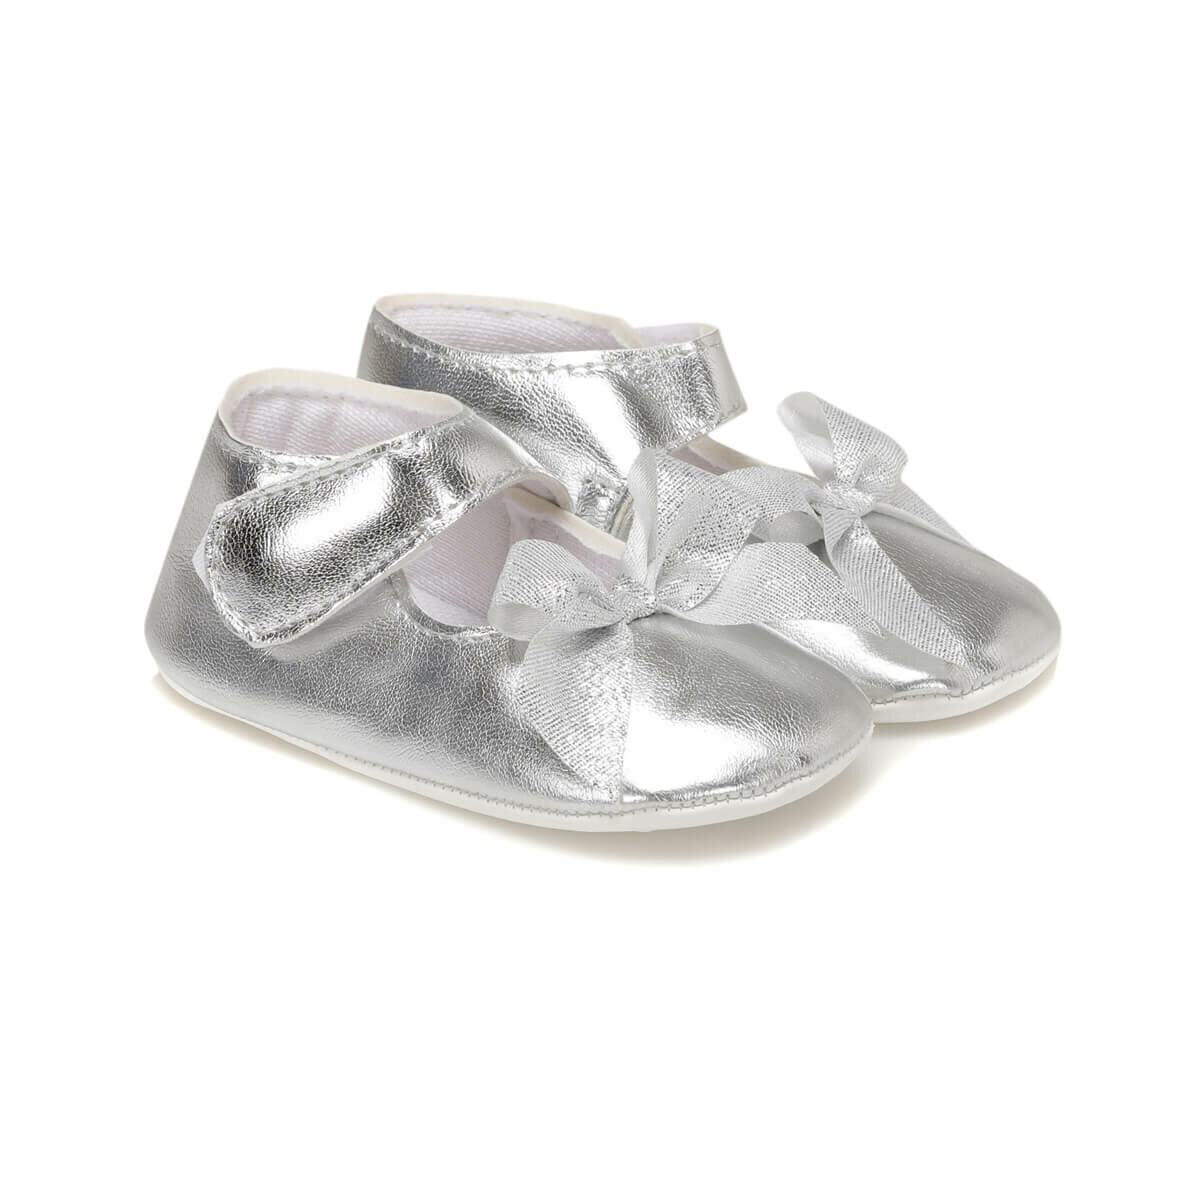 FLO 603 Silver Girl Children Shoes MINITTO